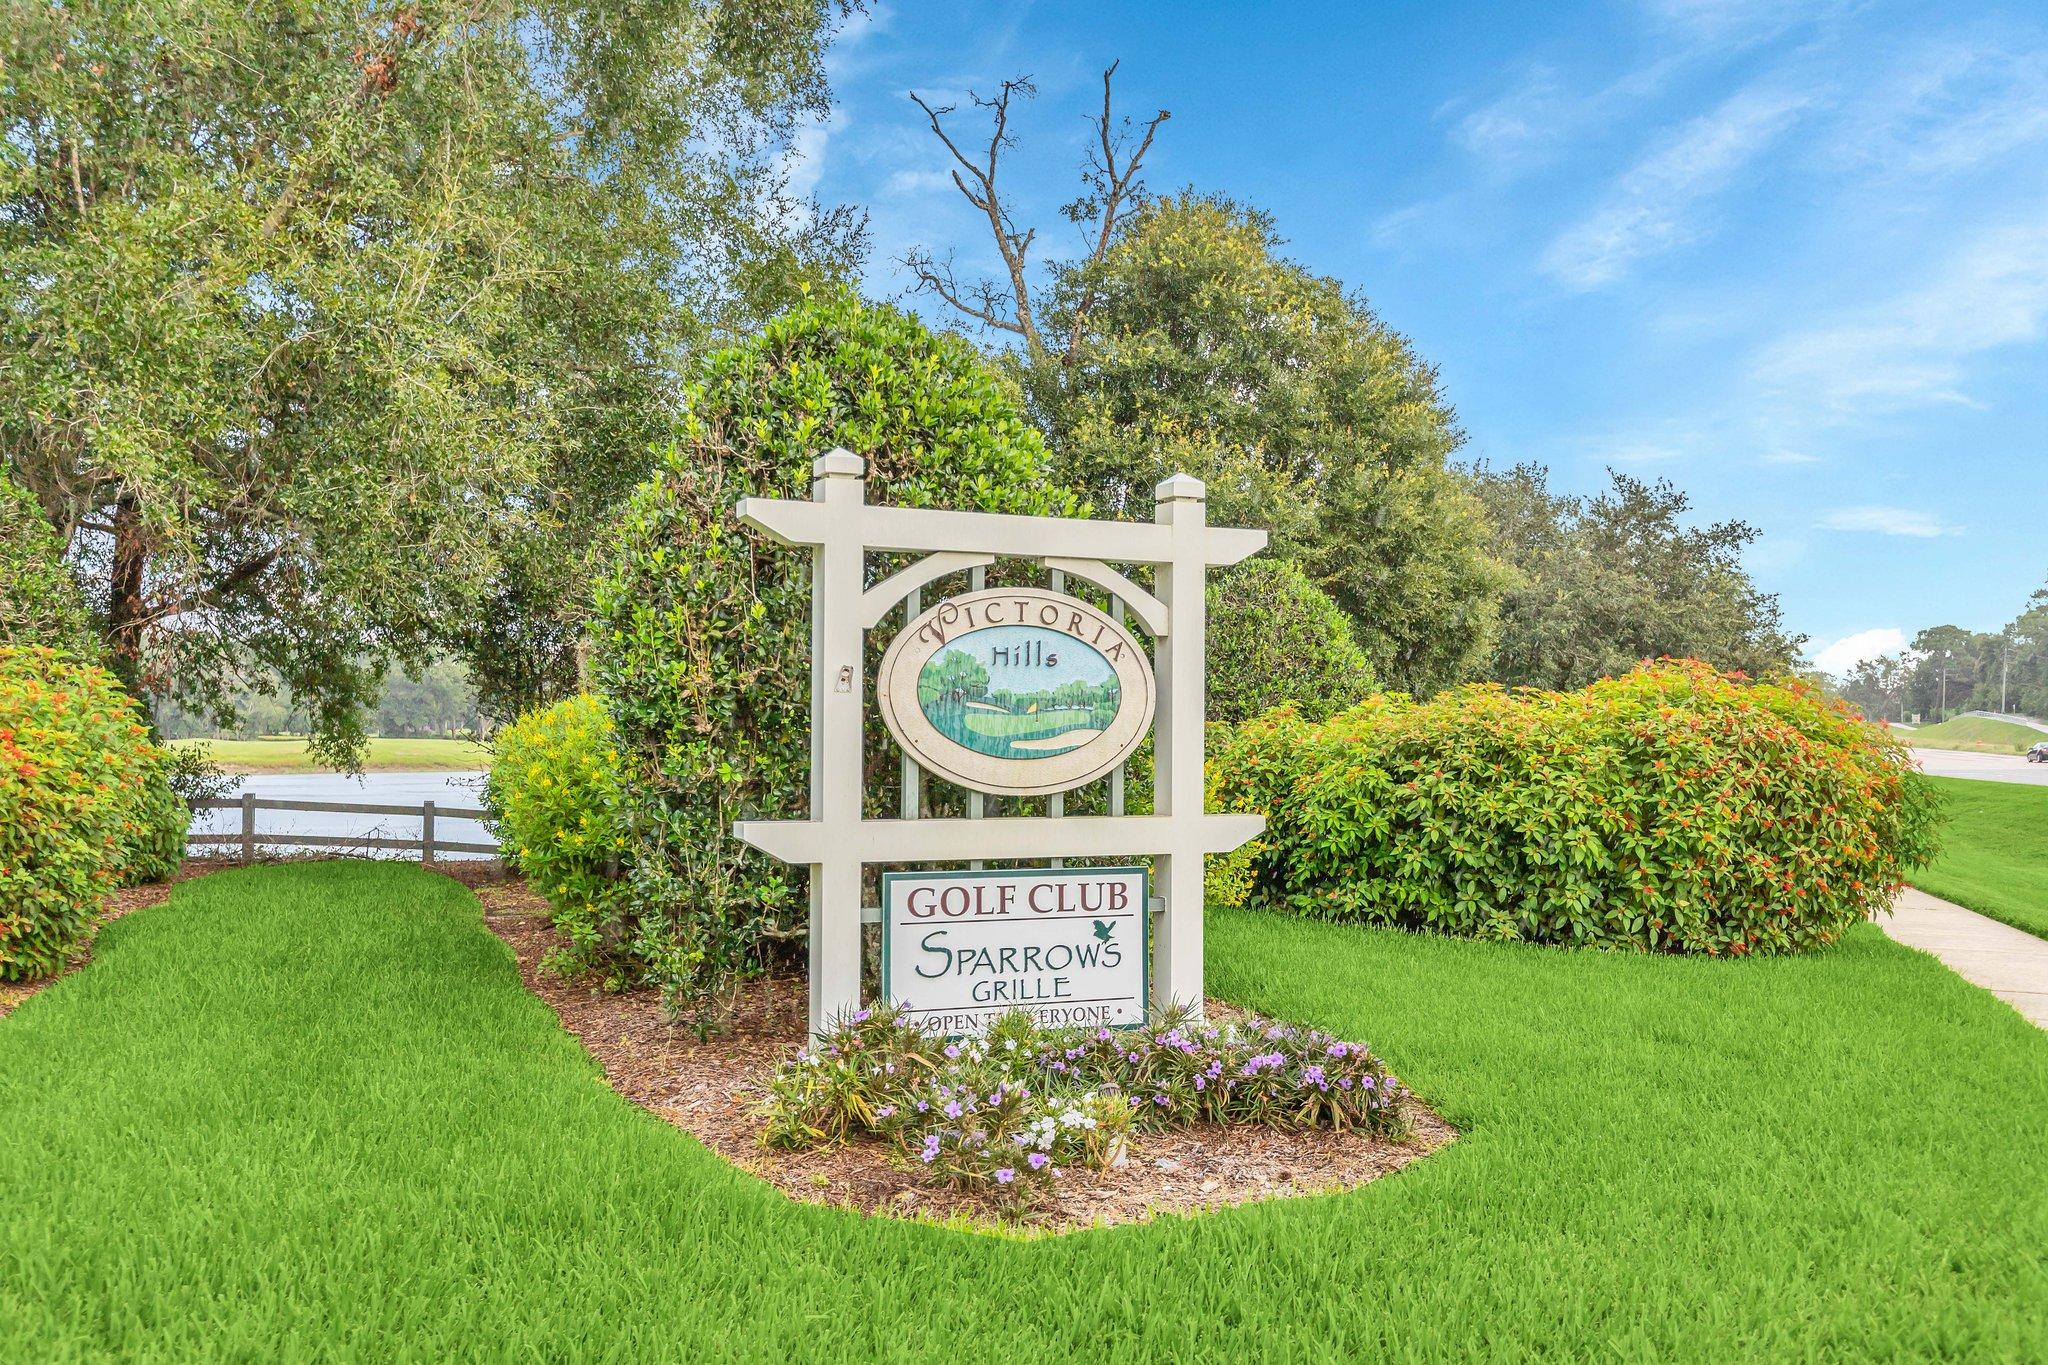 513 Victoria Hills Dr, DeLand, FL 32724, USA Photo 5